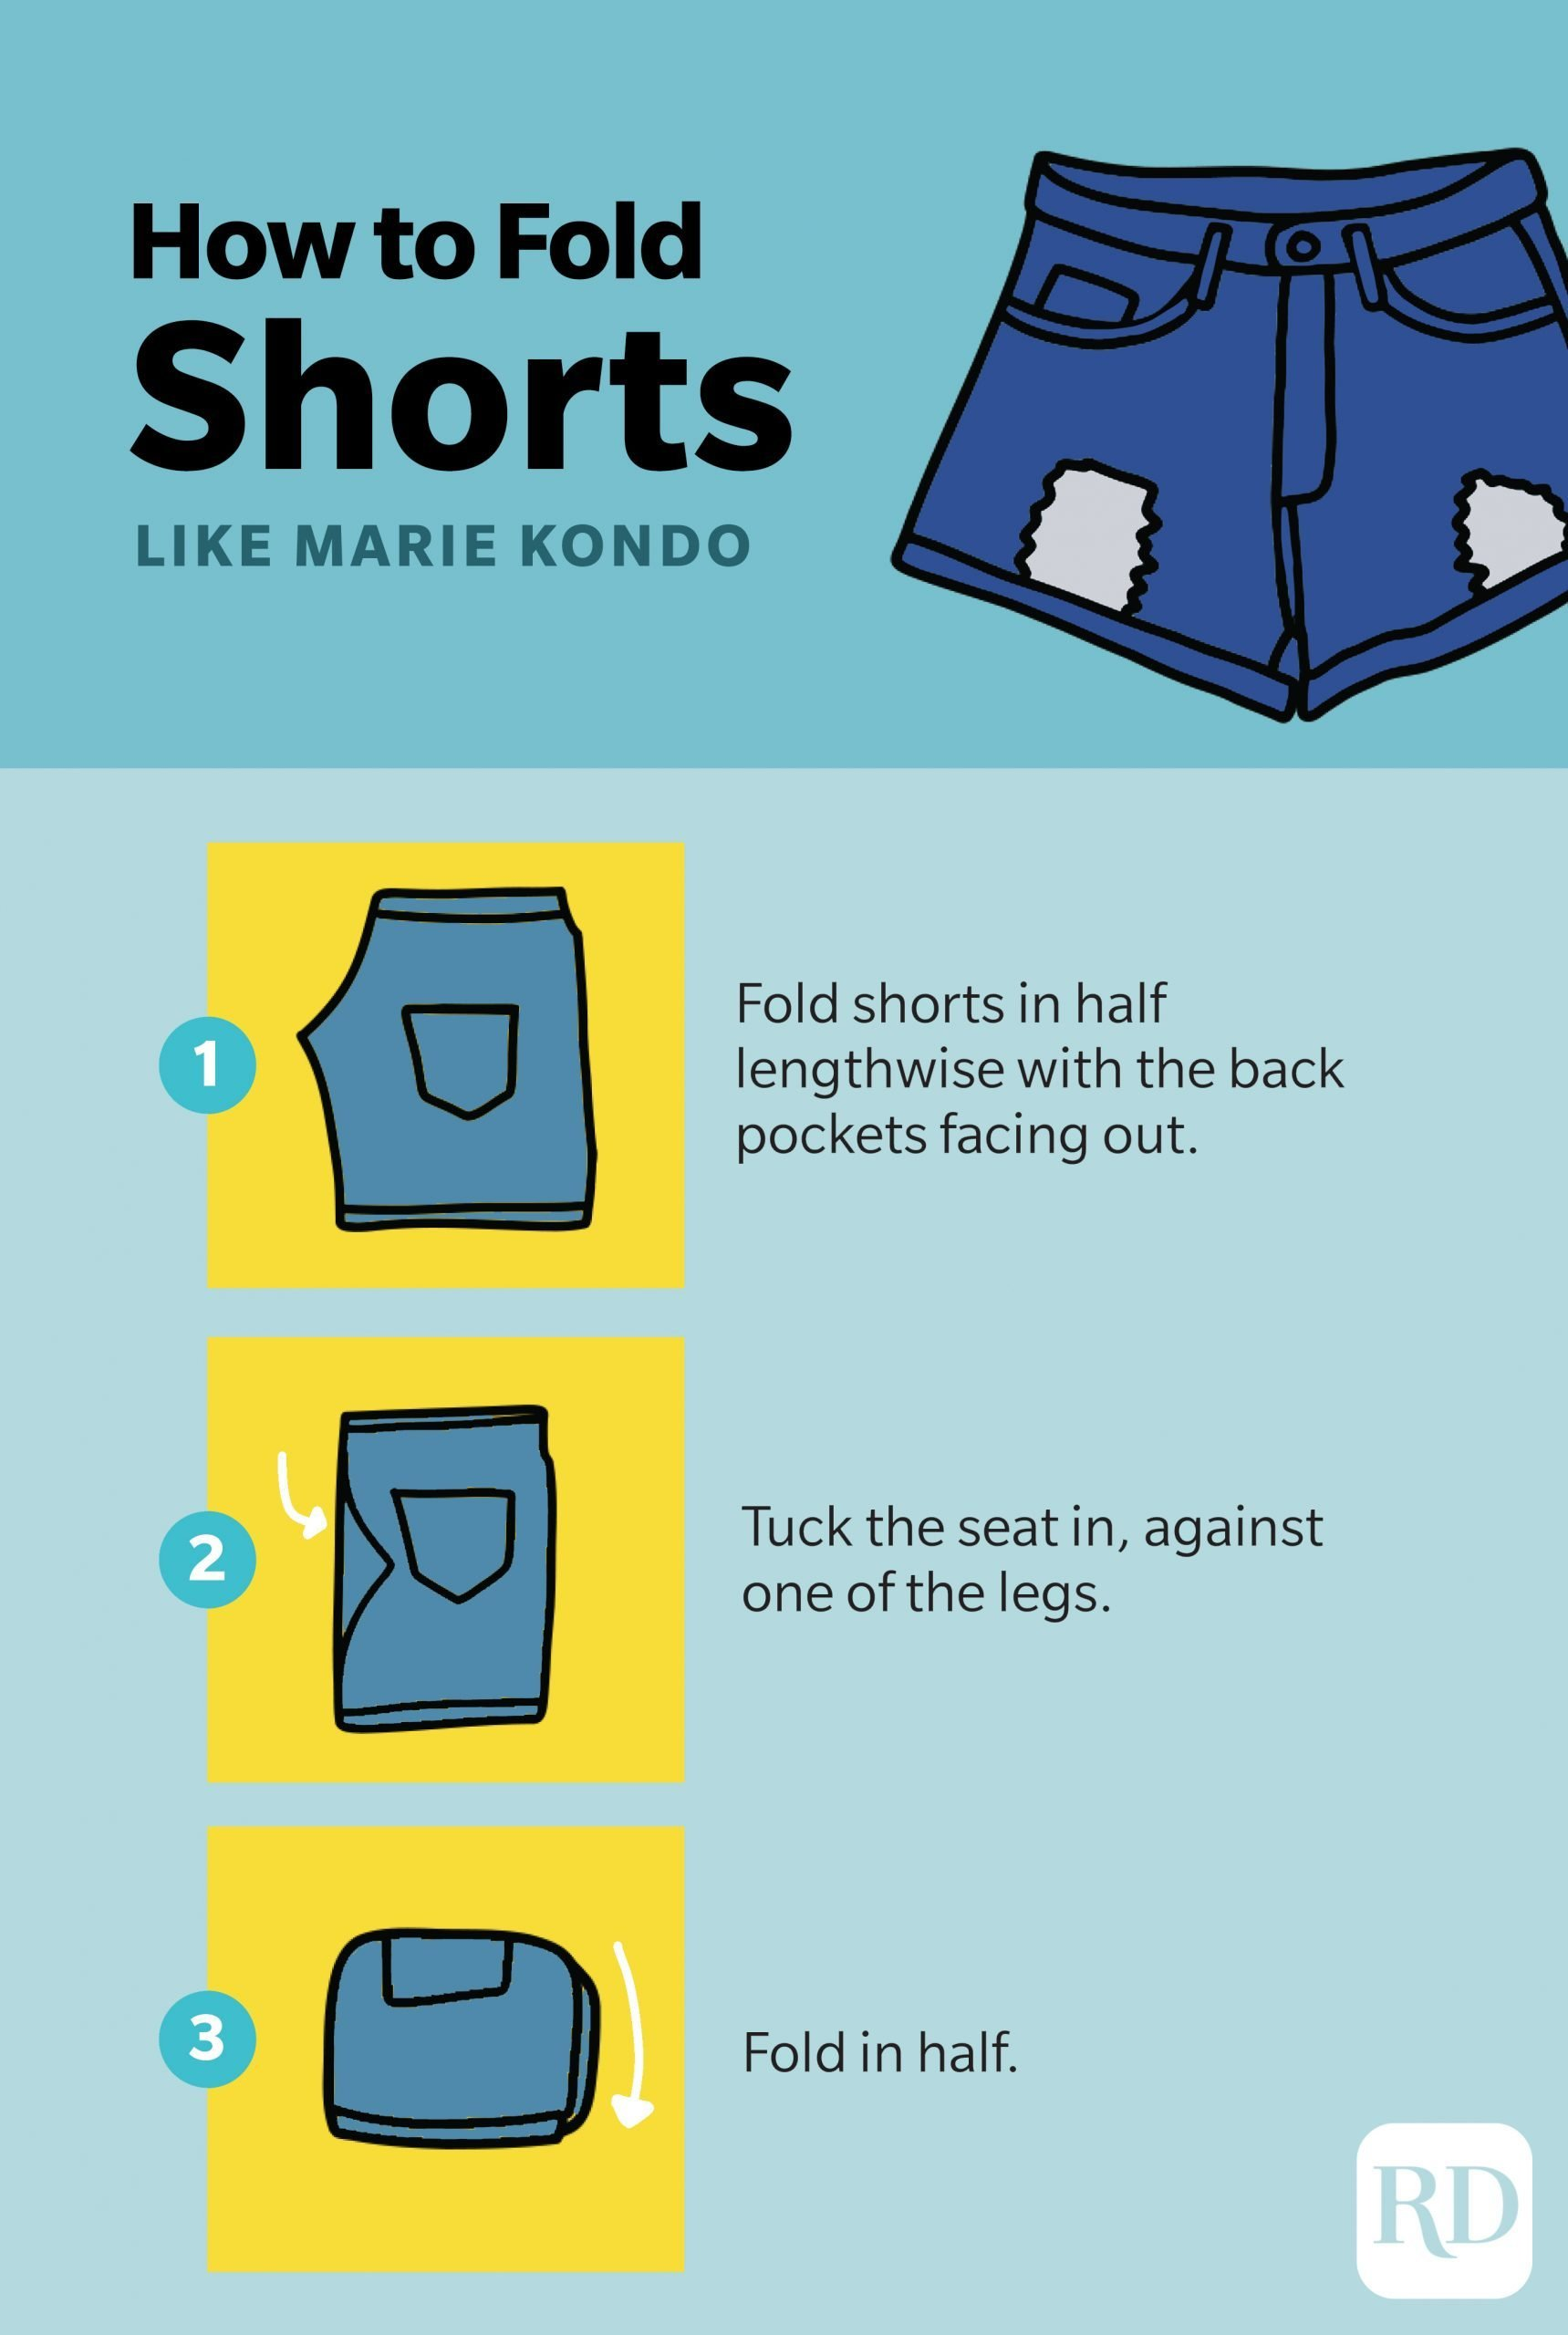 How to fold shorts like Marie Kondo infographic